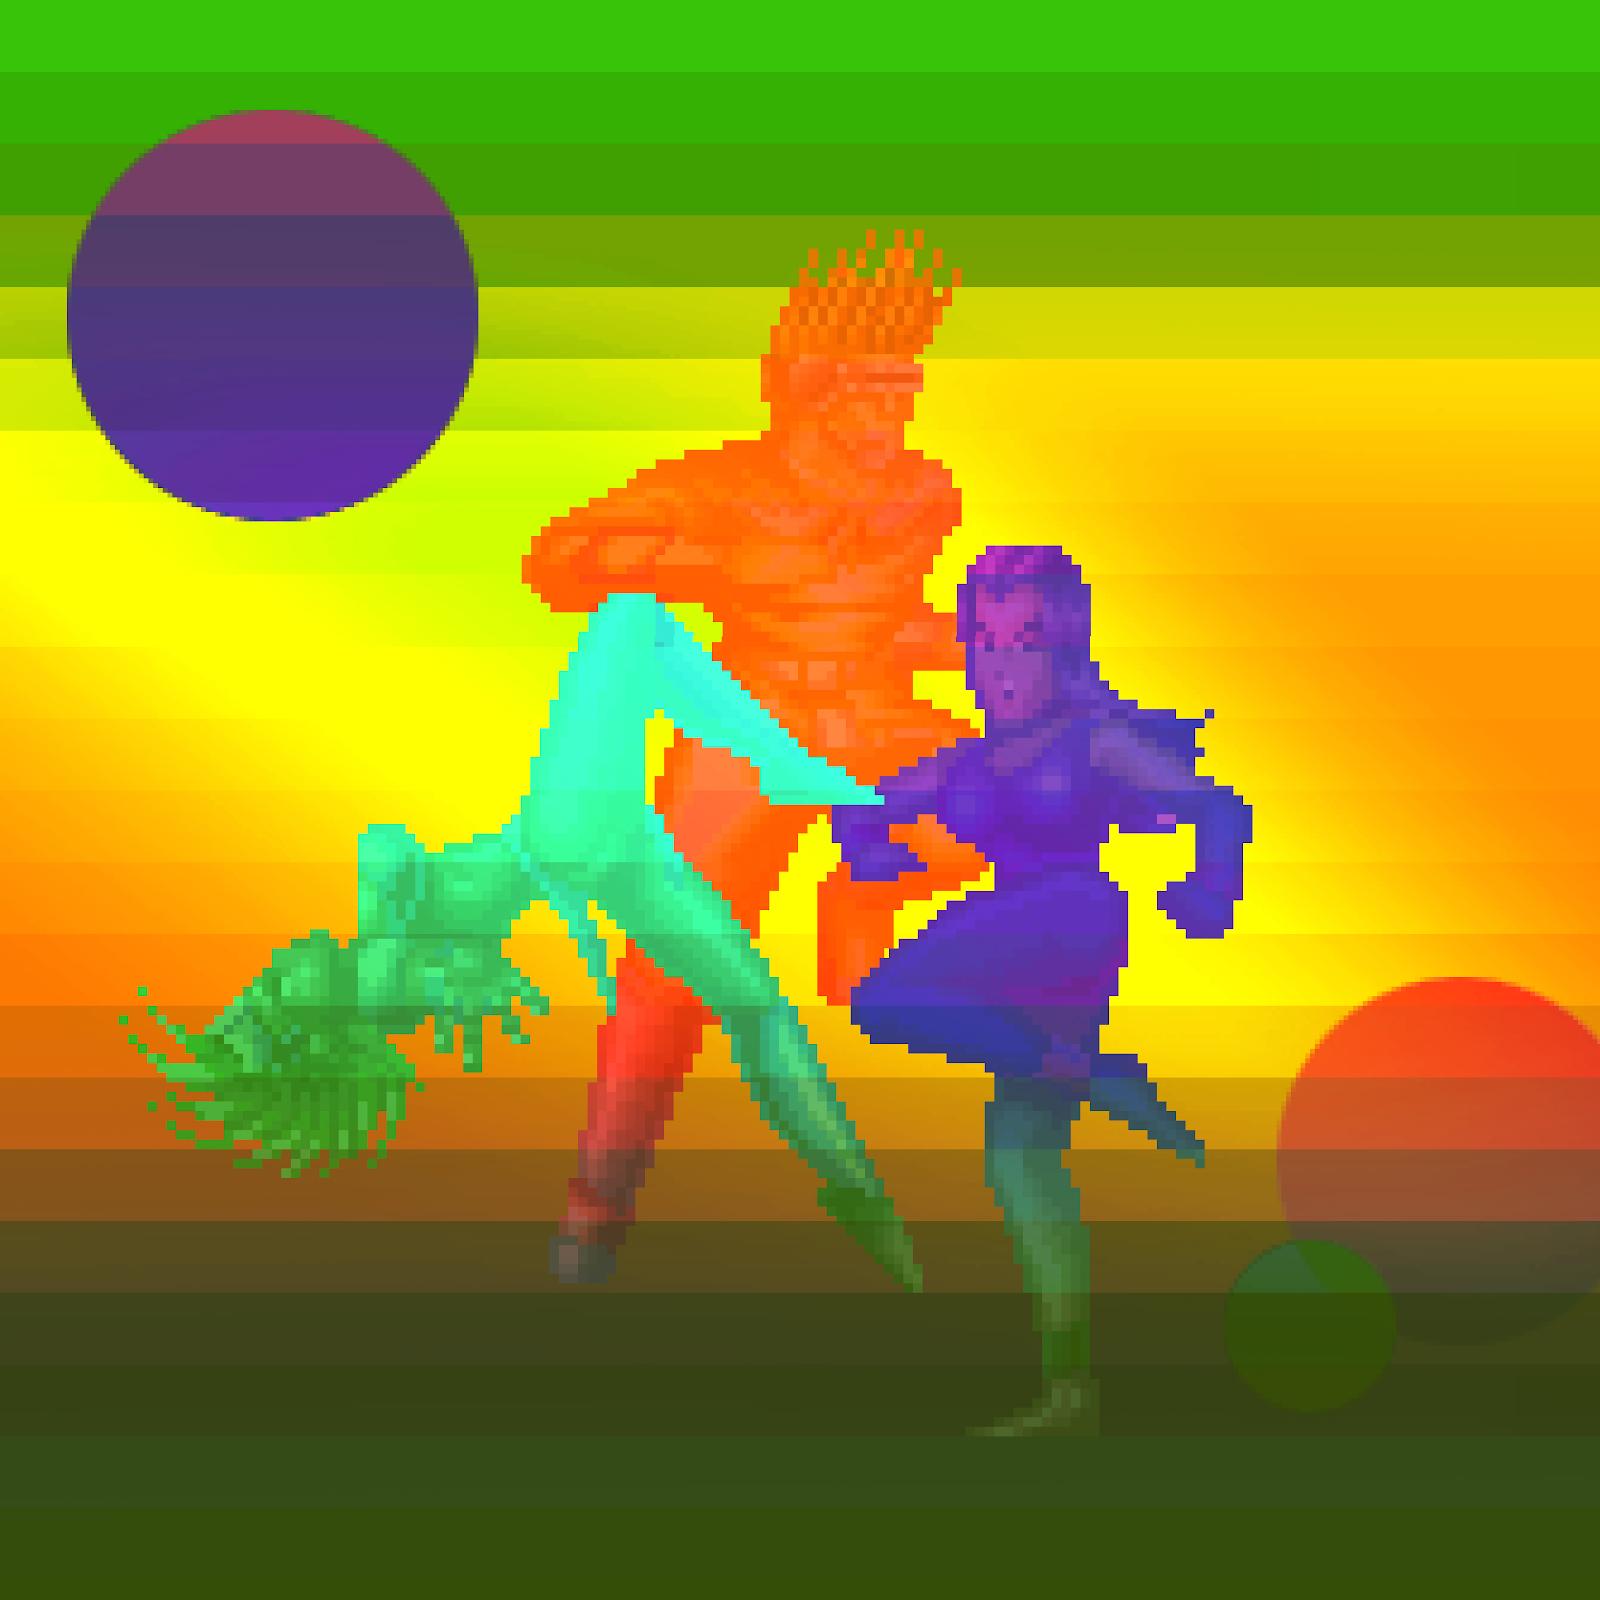 italo-disco-video-game.png